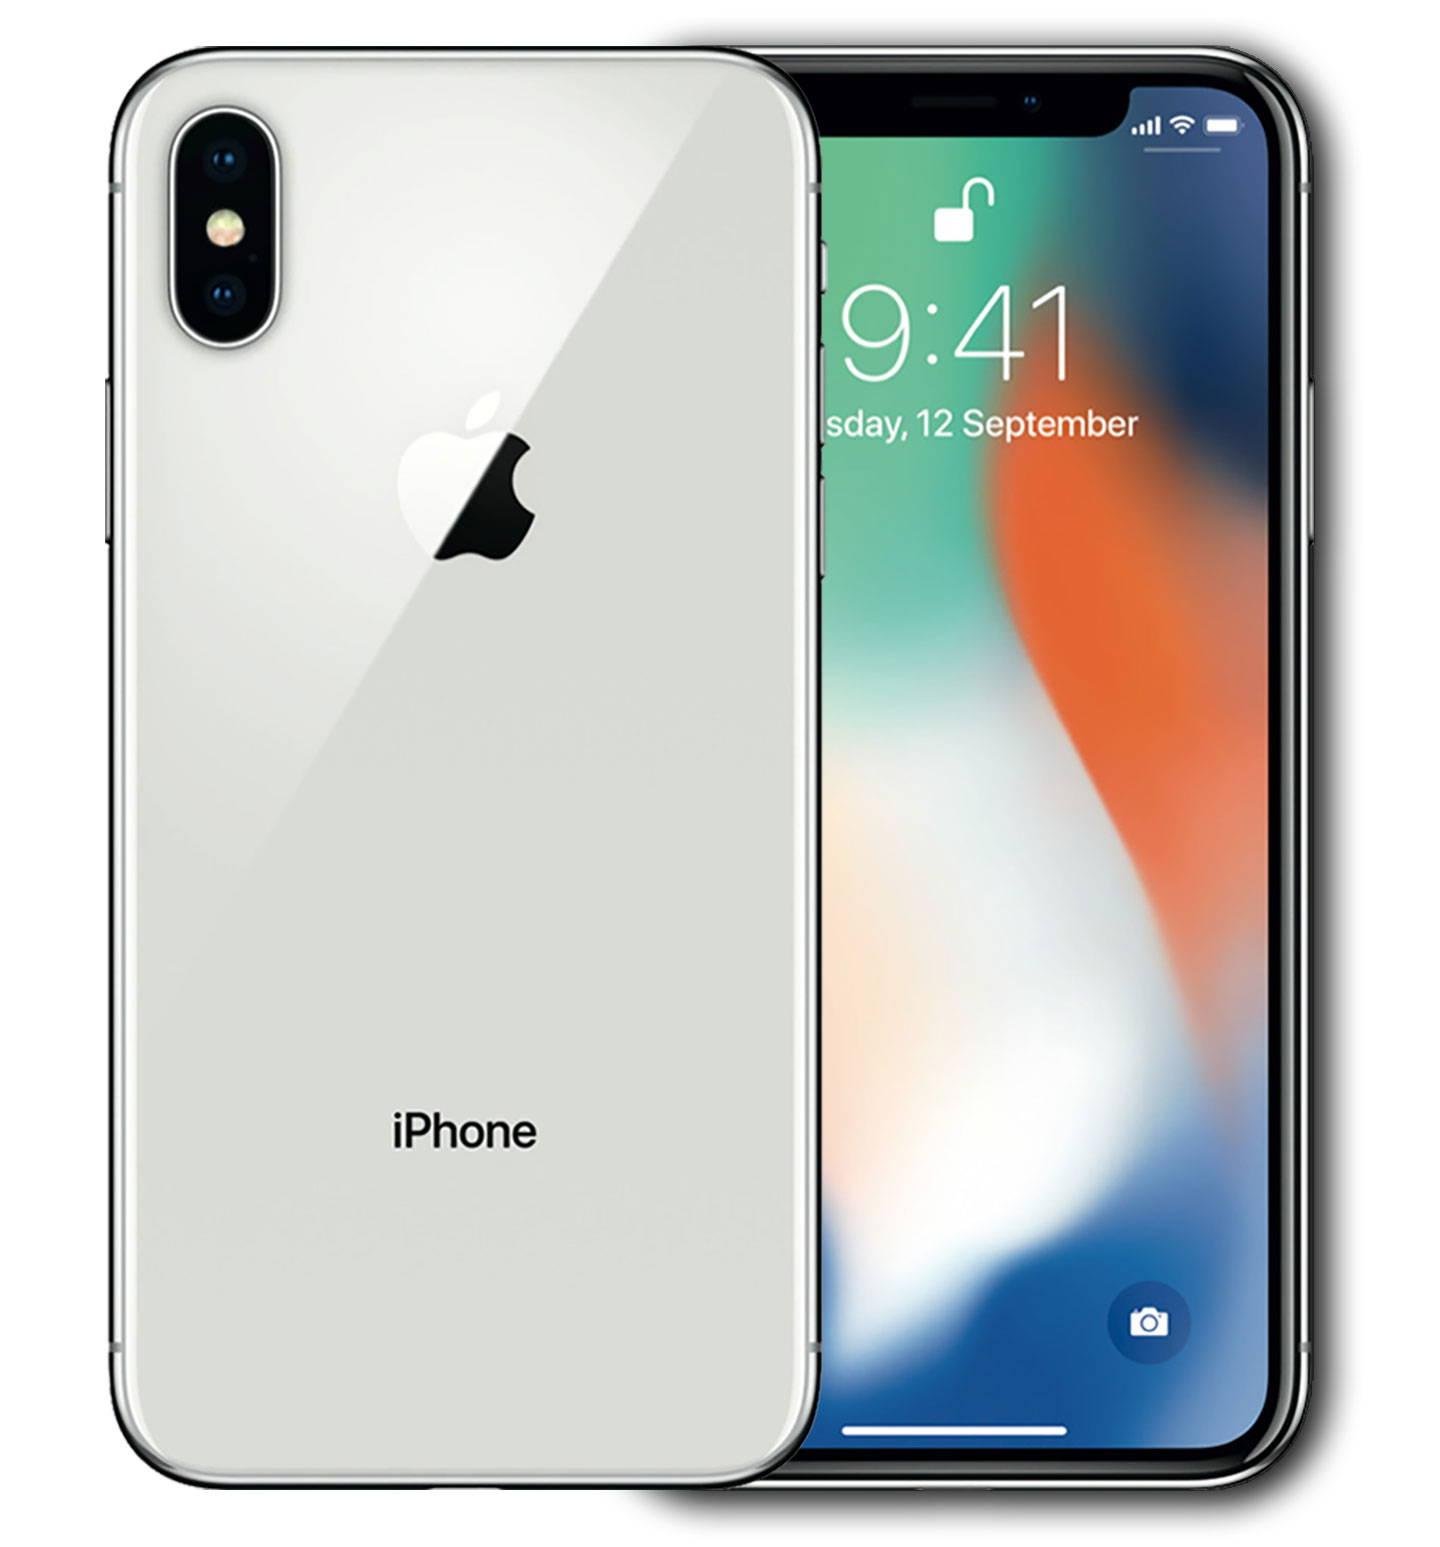 iPhone X decorative mobile phone skins. Create your own custom phone wrap online with jwskinz.com.